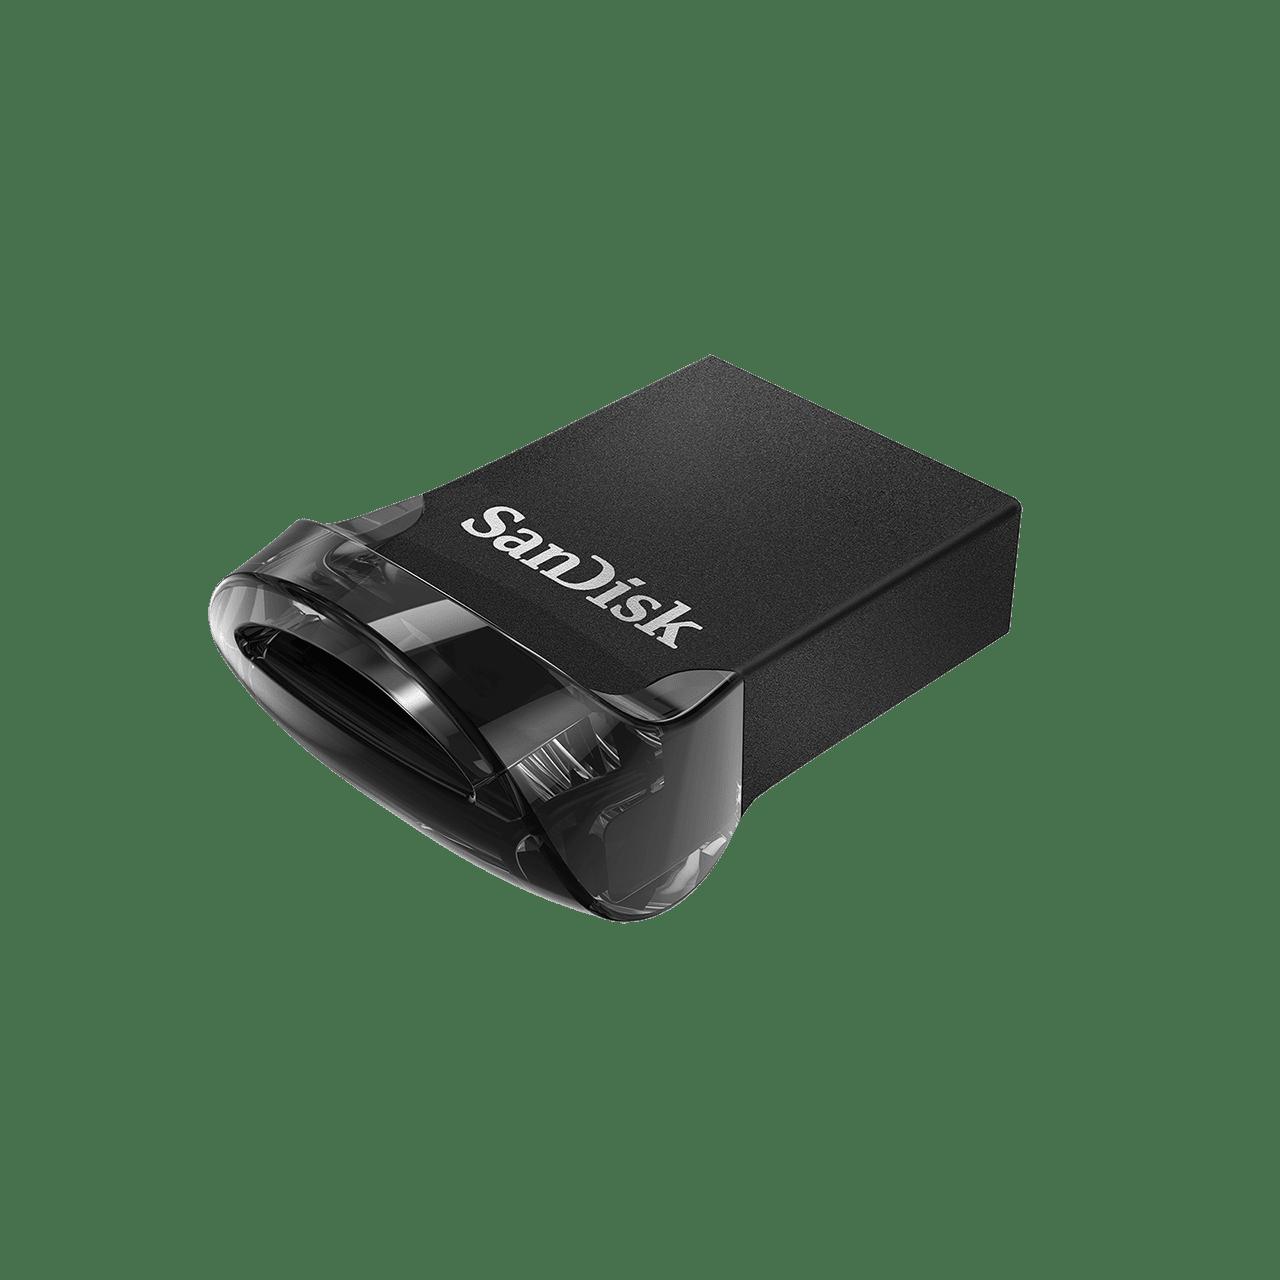 SANDISK Ultra Fit USB 3.1 フラッシュドライブ SDCZ430-512G-J57.png